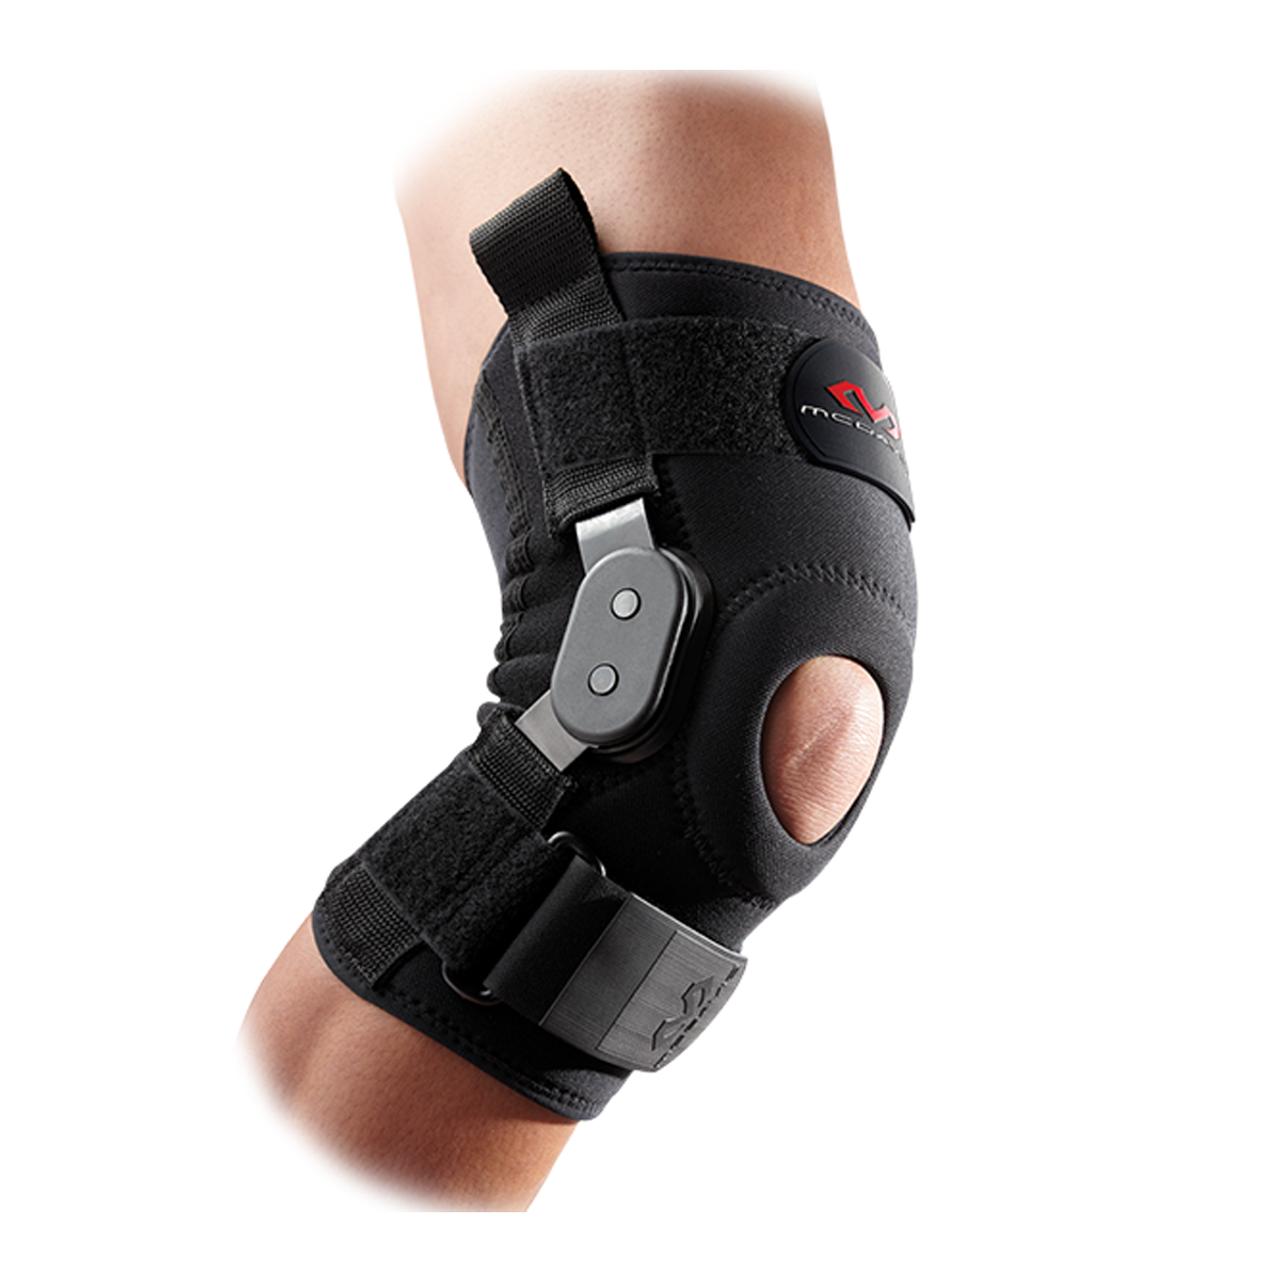 ab4fb30540 McDavid Knee Brace w/Polycentric Hinges   Braces & Supports ...